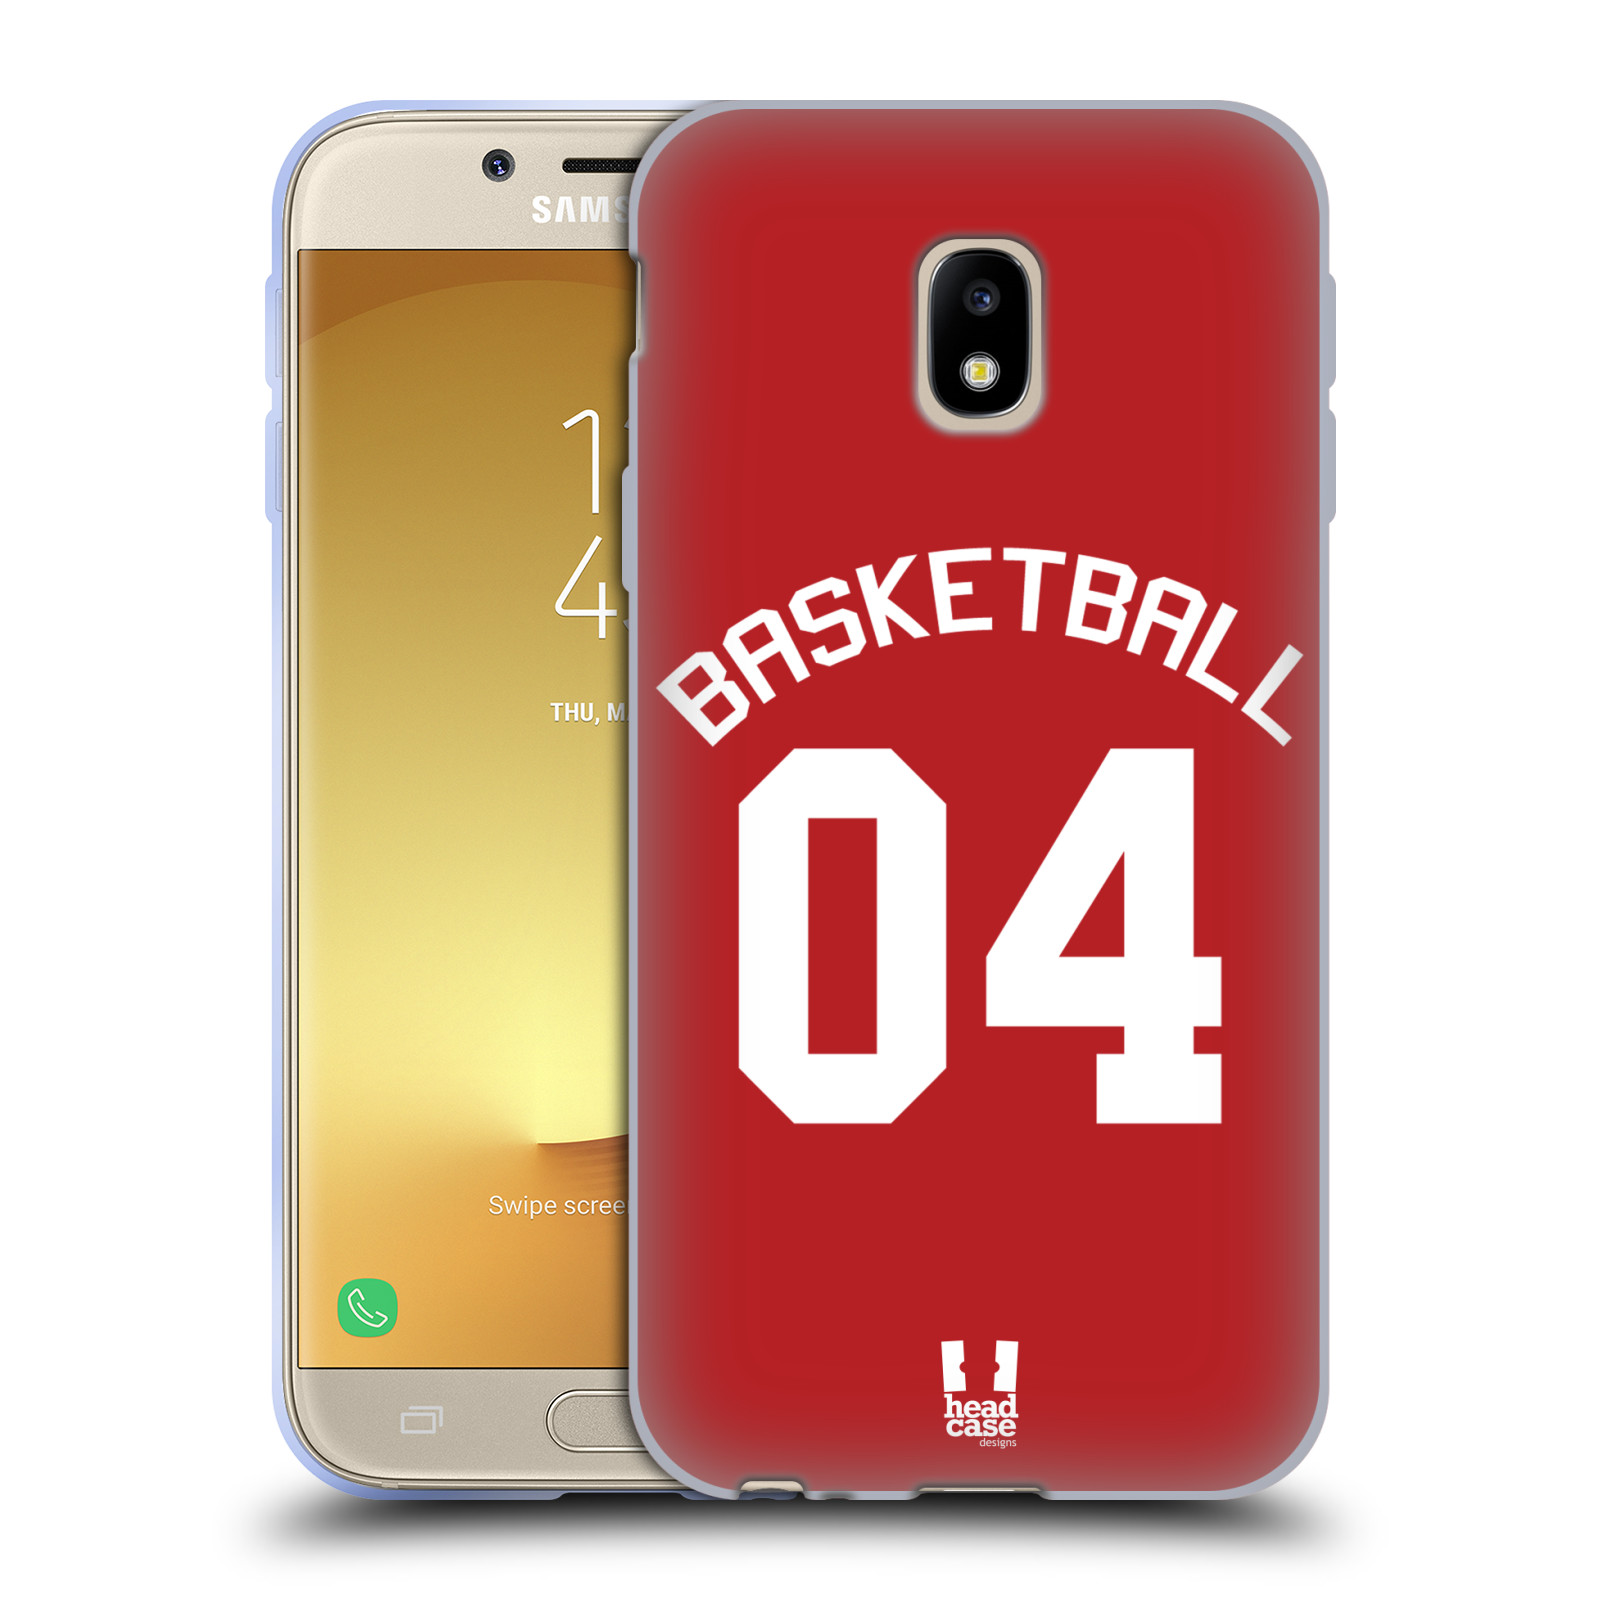 HEAD CASE silikonový obal na mobil Samsung Galaxy J3 2017 (J330, J330F) Sportovní dres Basketbal červený